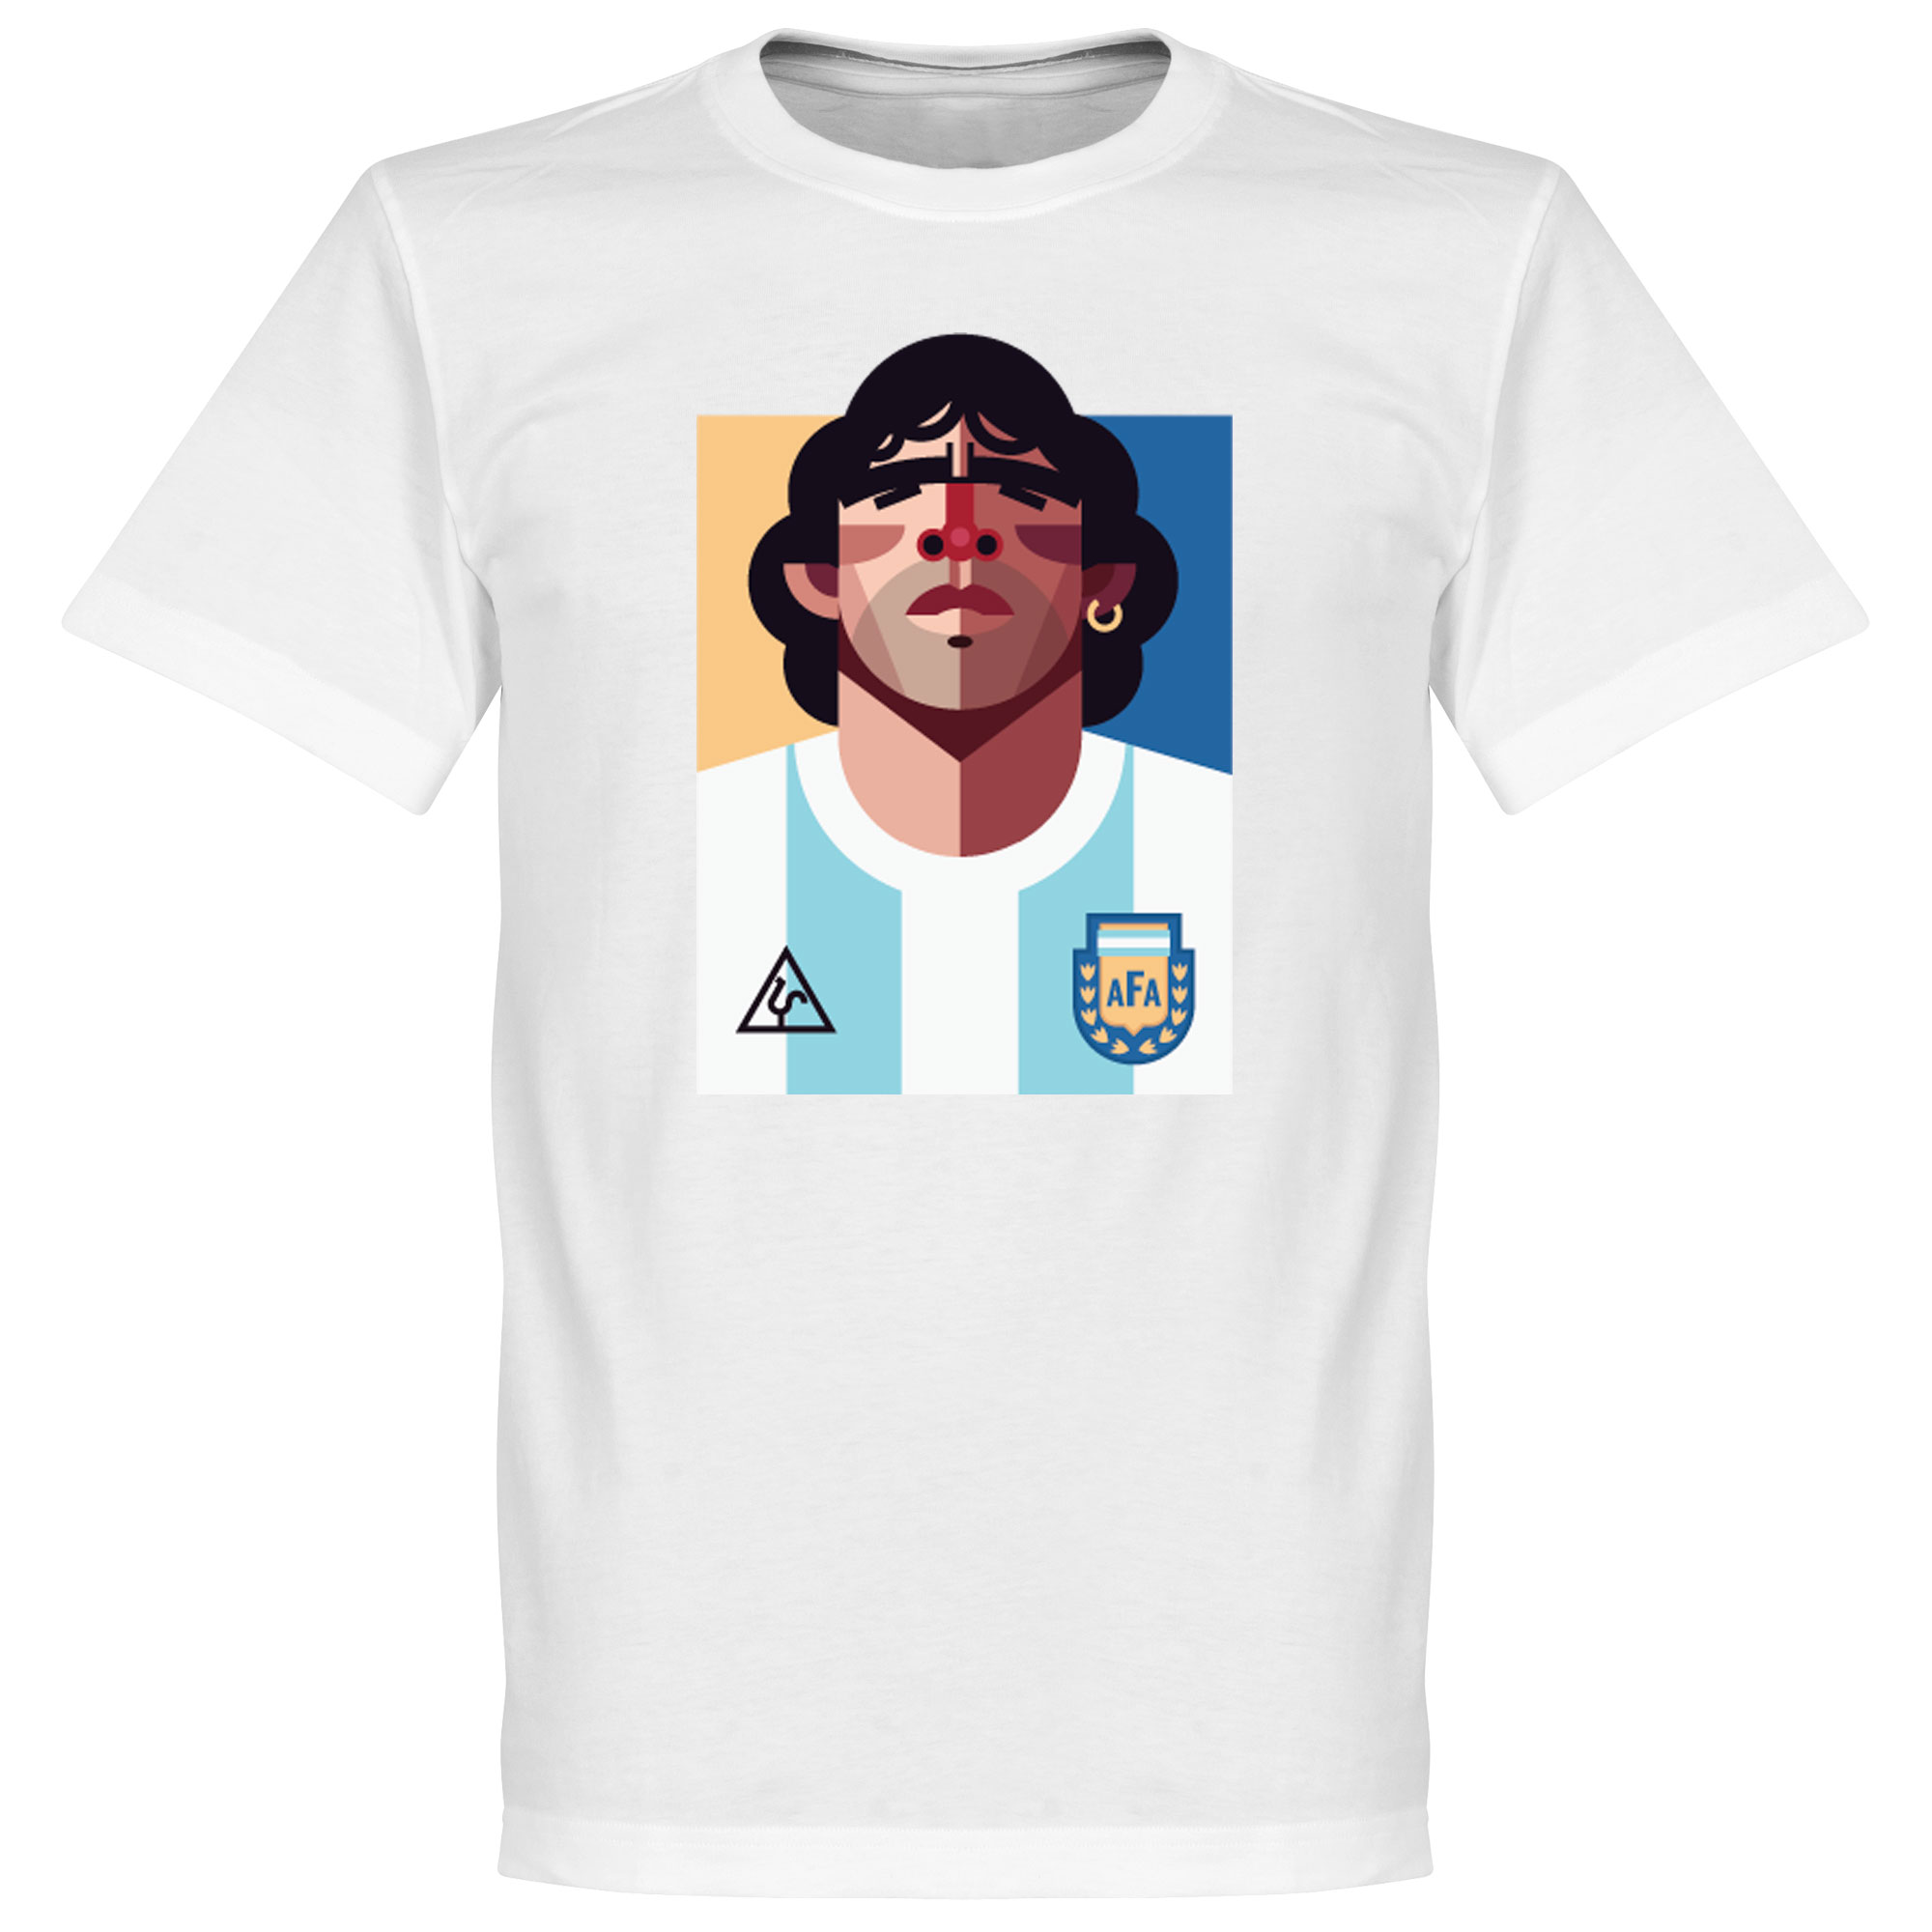 Playmaker Maradona Tee - M